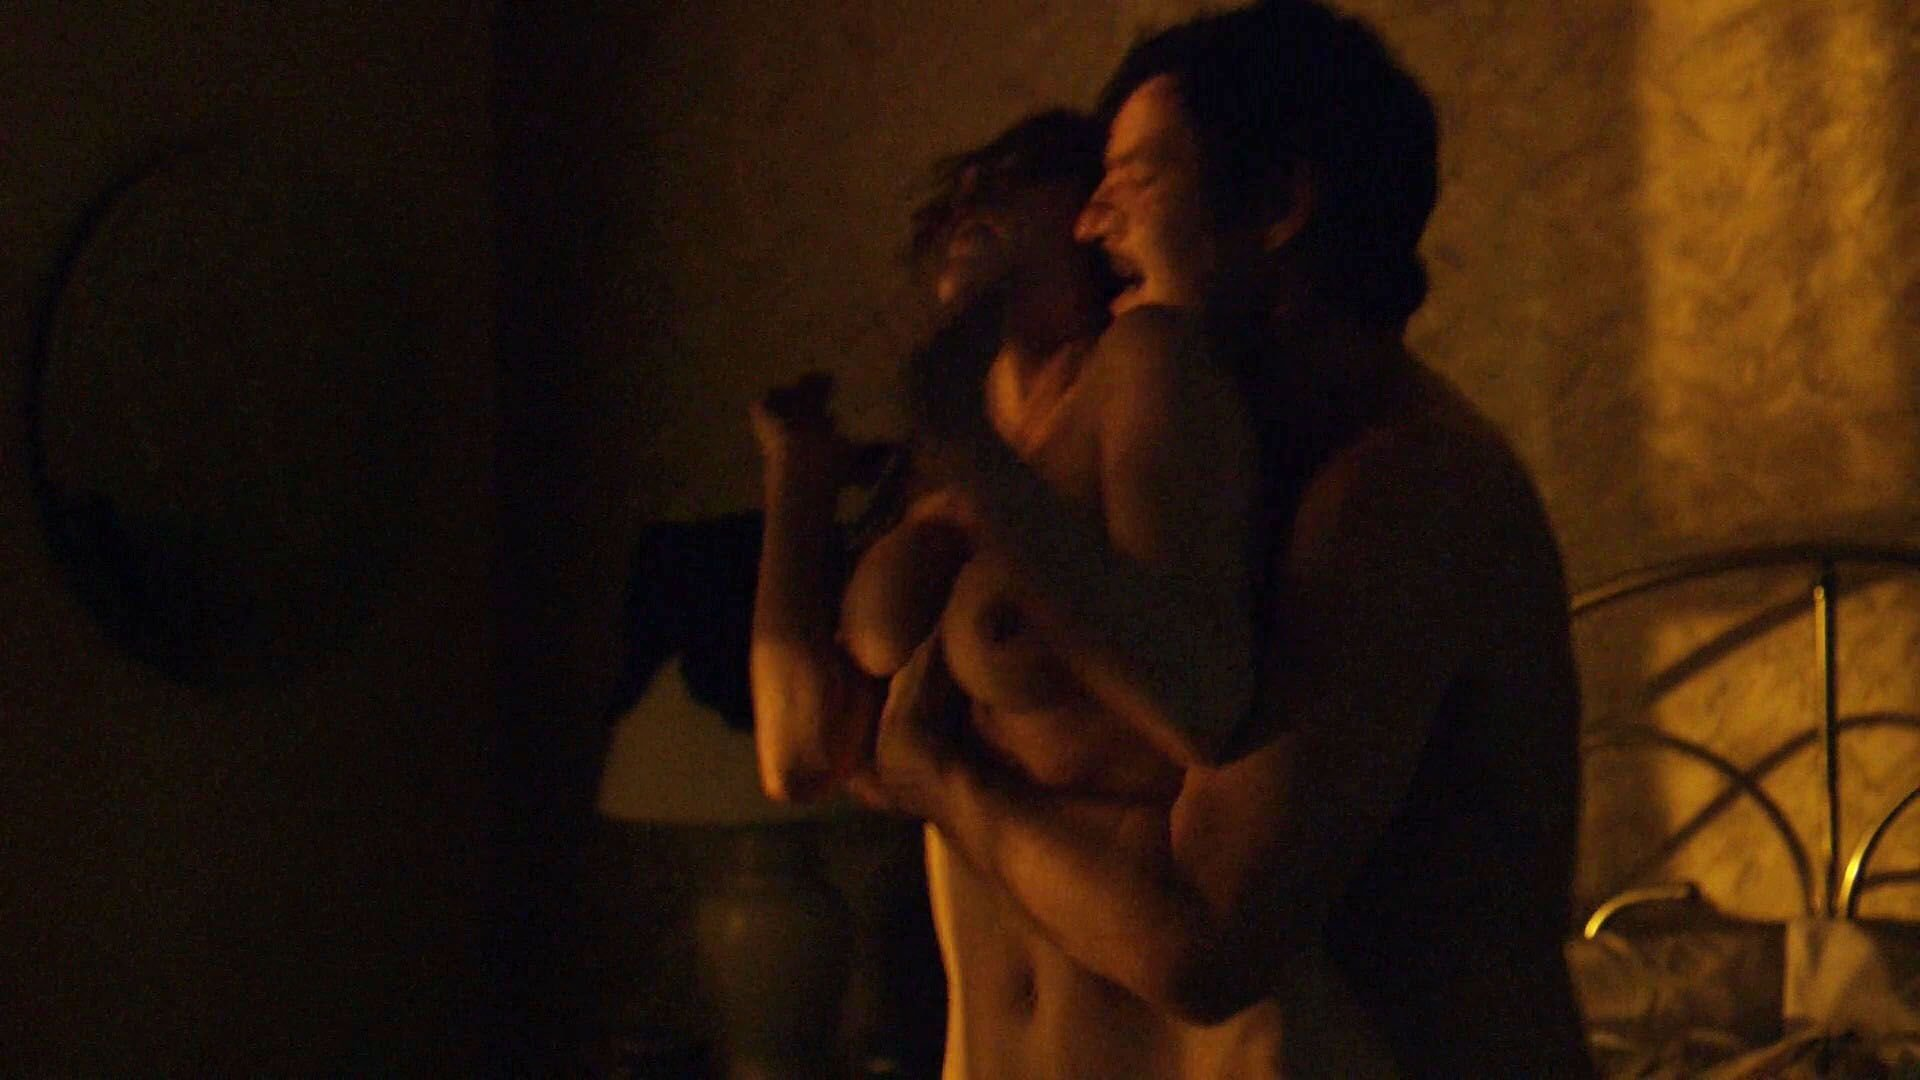 Carolina acevedo topless naked (64 pic)